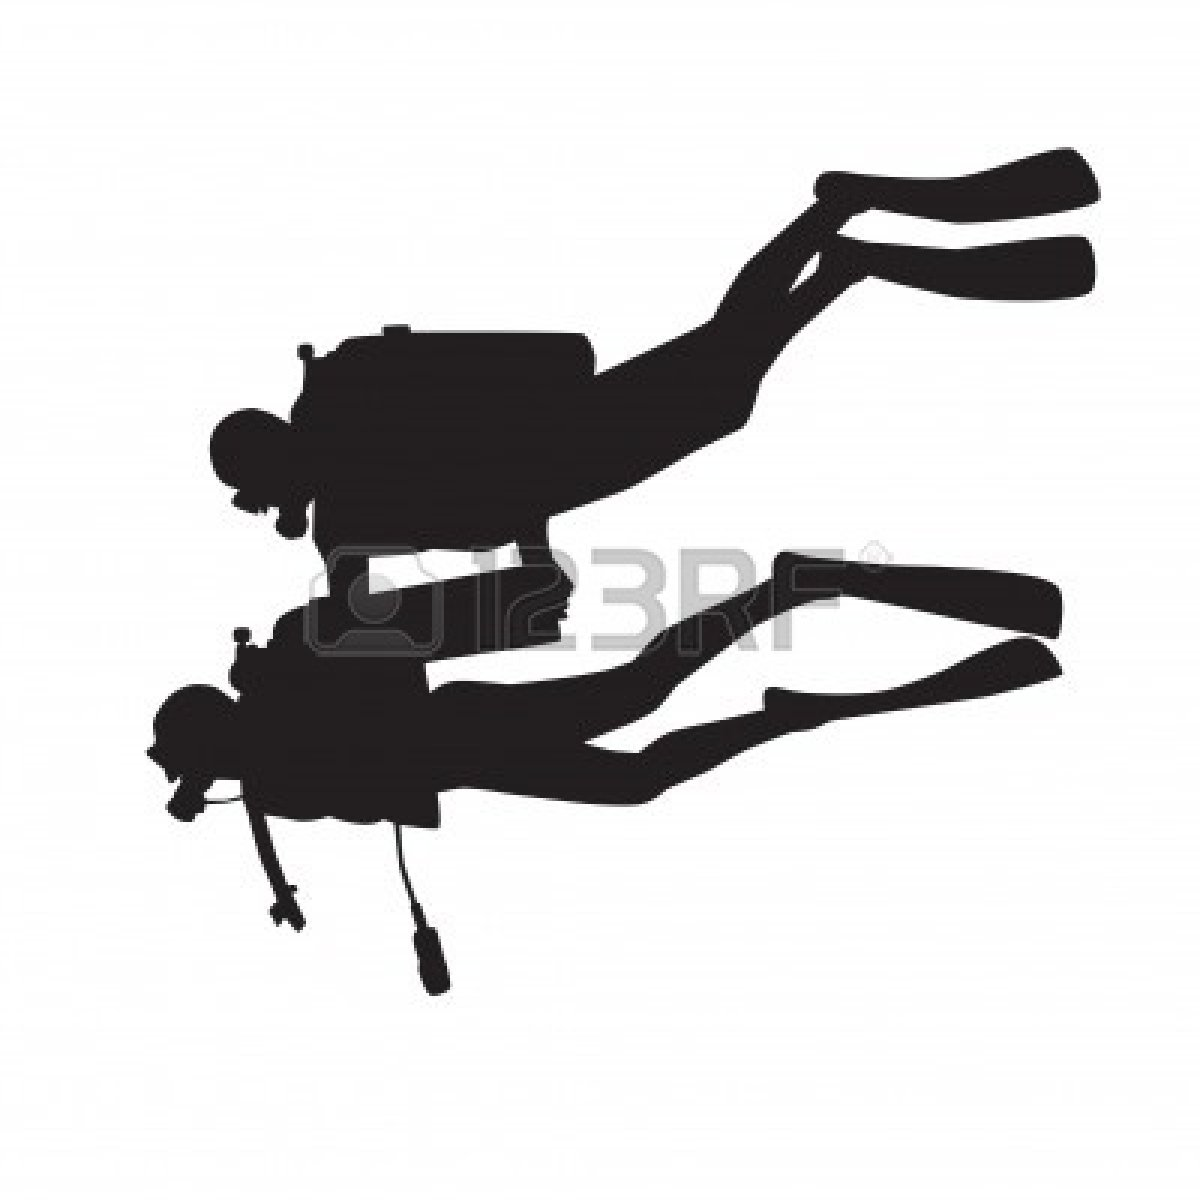 1200x1200 Diver Silhouette Clipart Incredible Scuba Diving Silhouettes